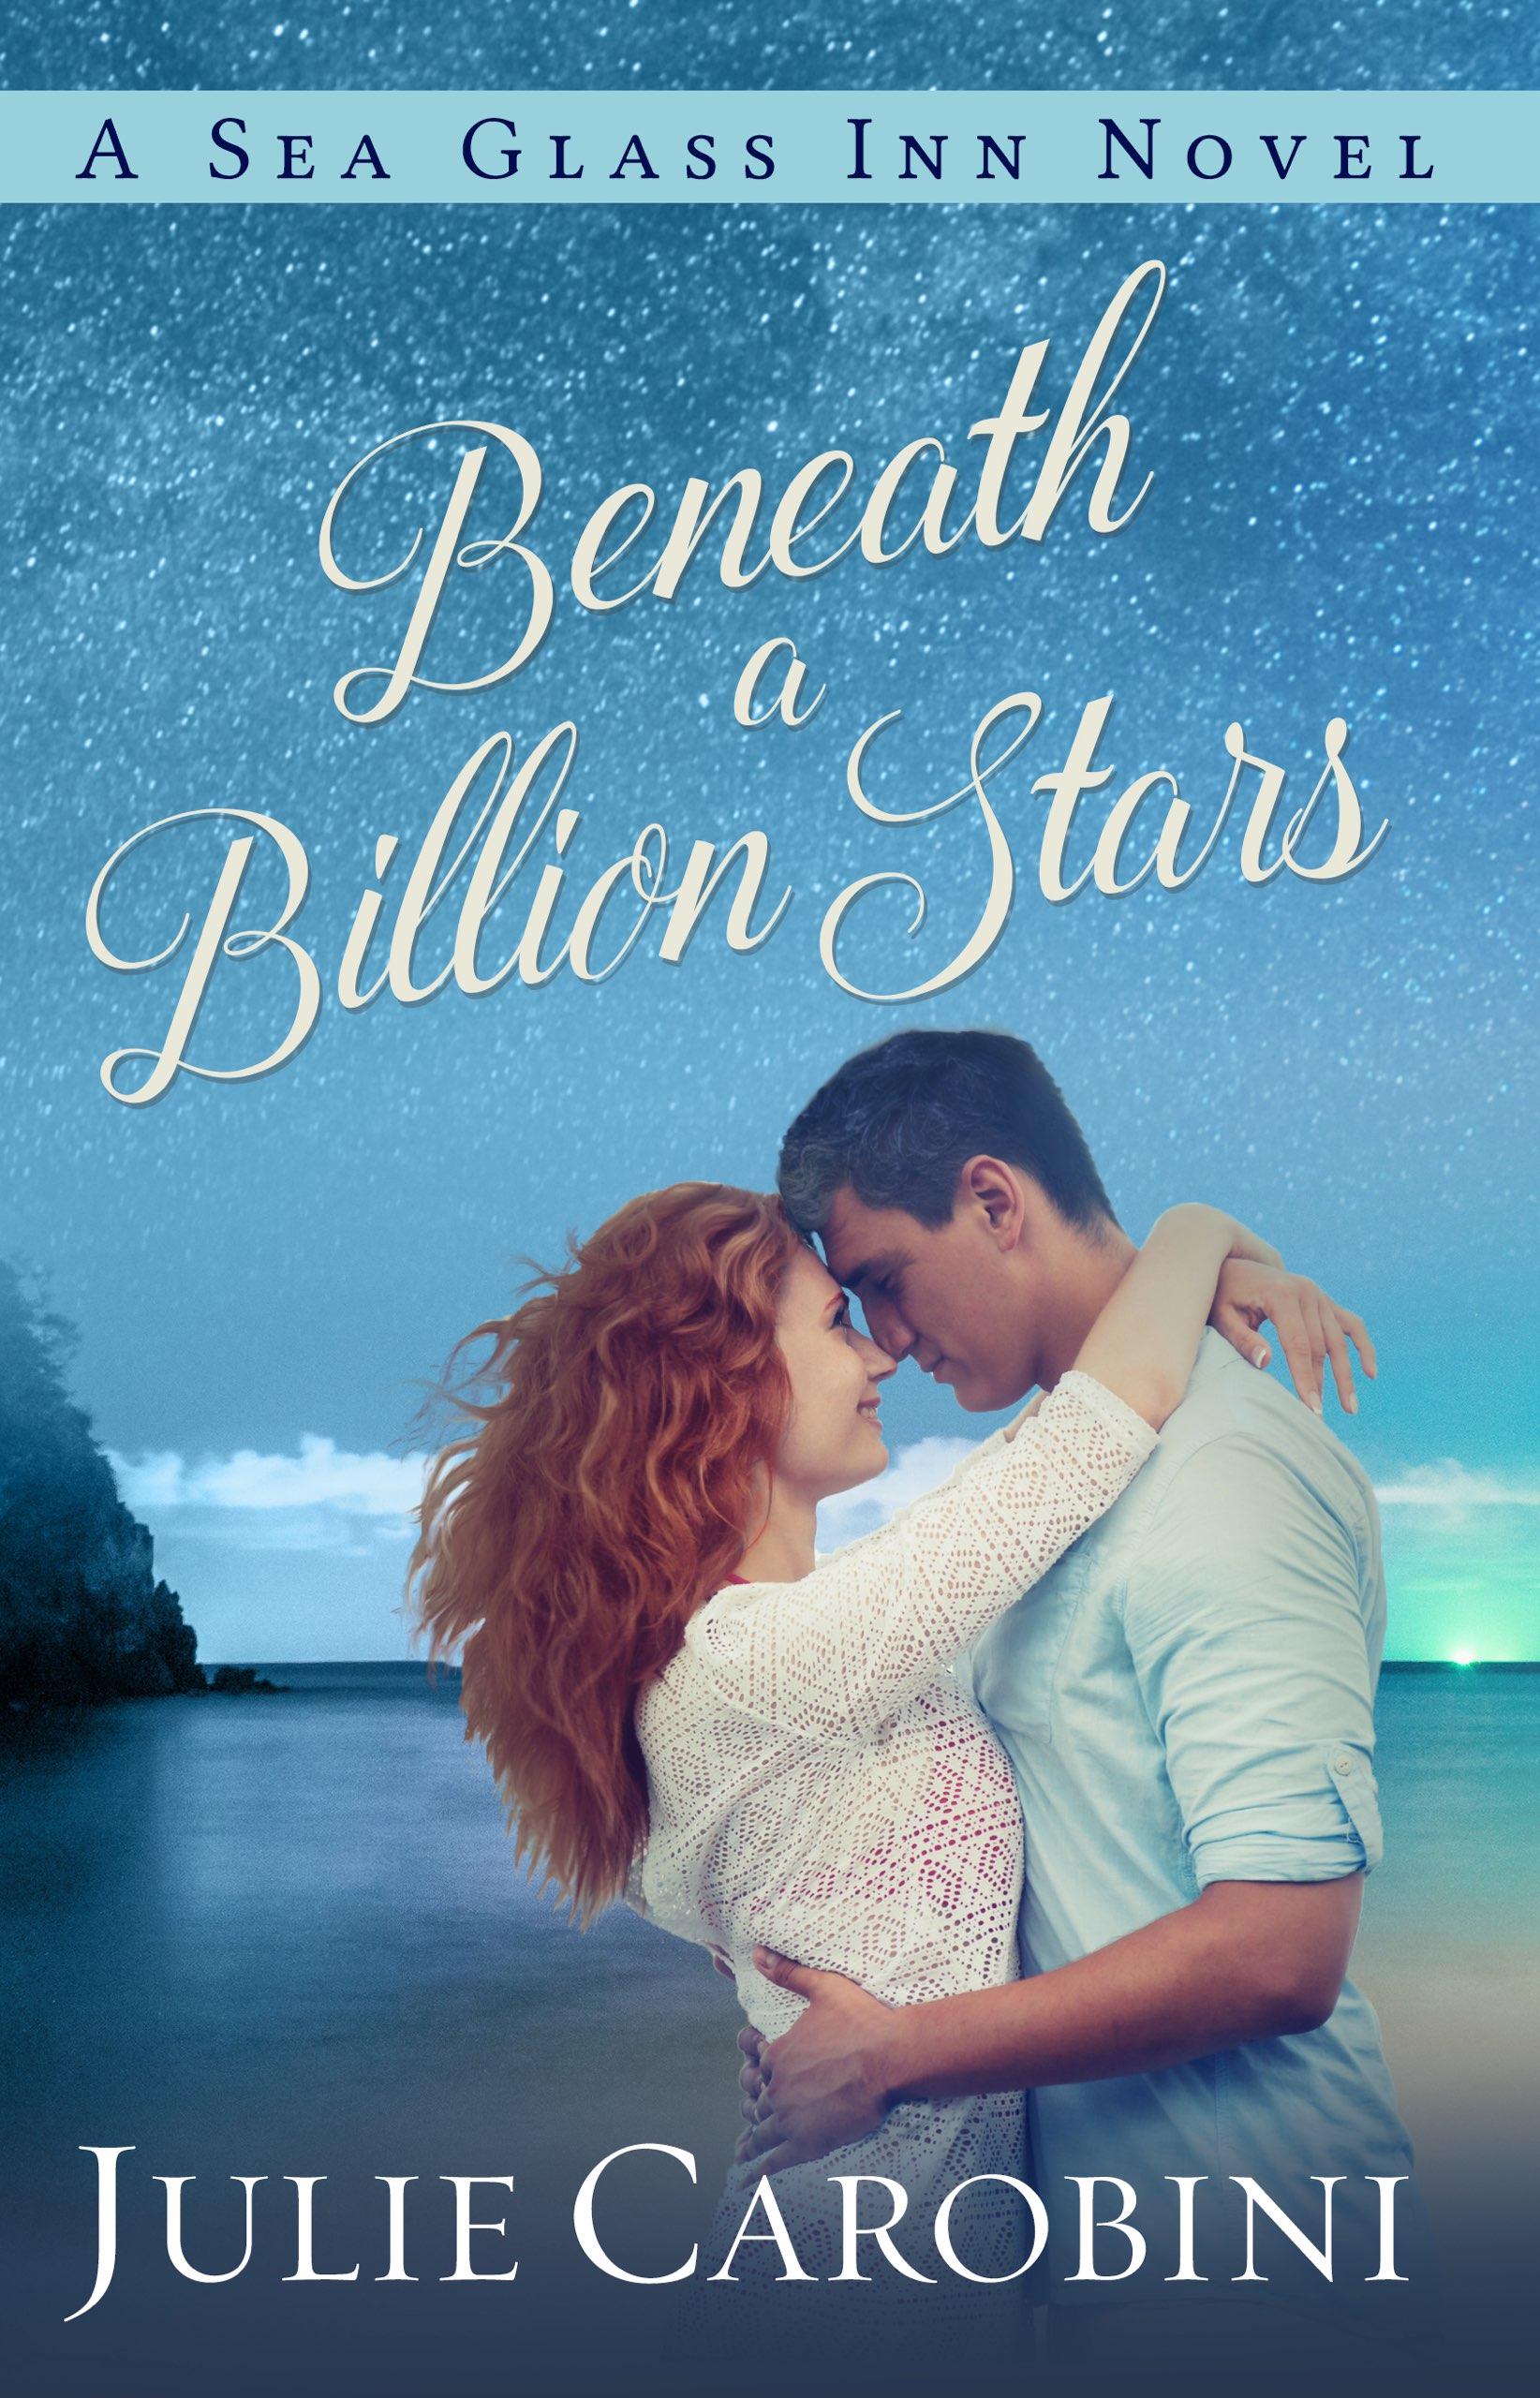 Beneath a Billion Stars, an Ebook by Julie Carobini